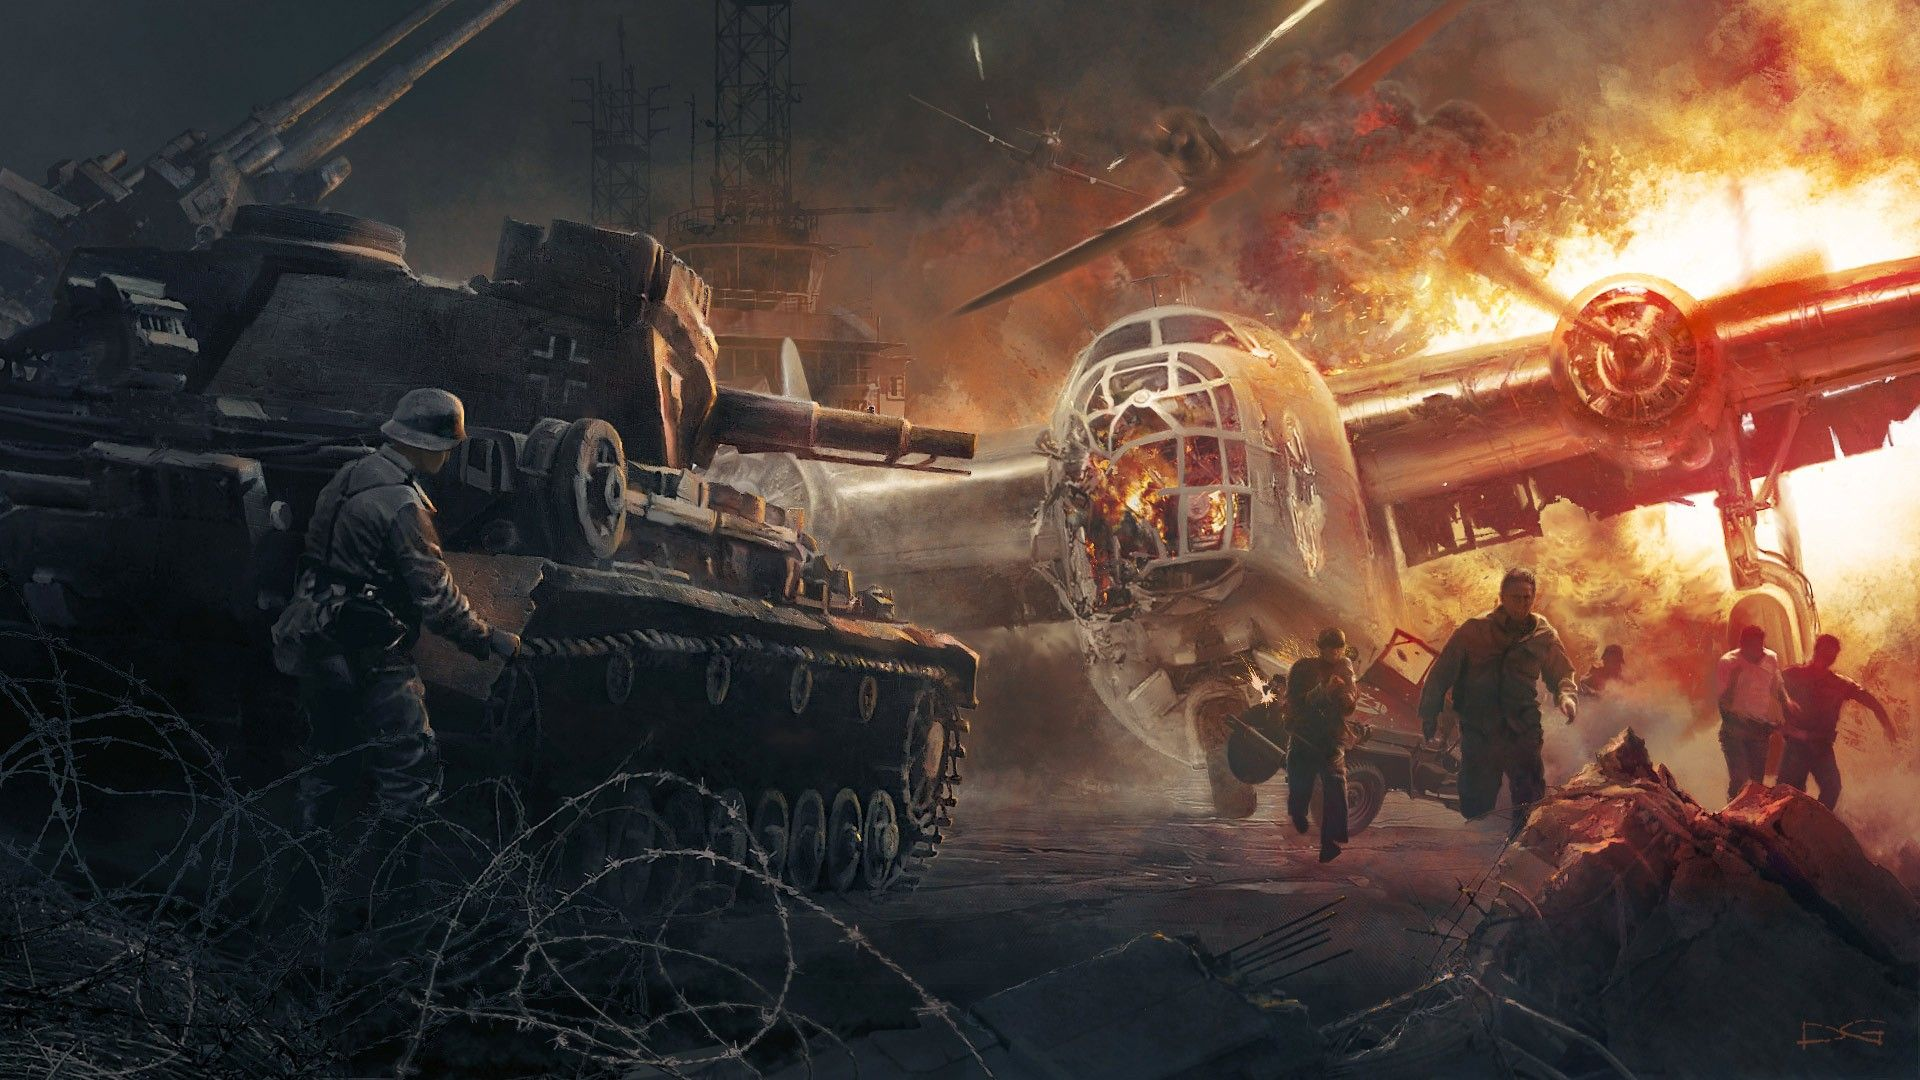 World War 2 Tank Wallpaper For Android On Wallpaper 1080p Hd Military Poster Tank Wallpaper War Artwork